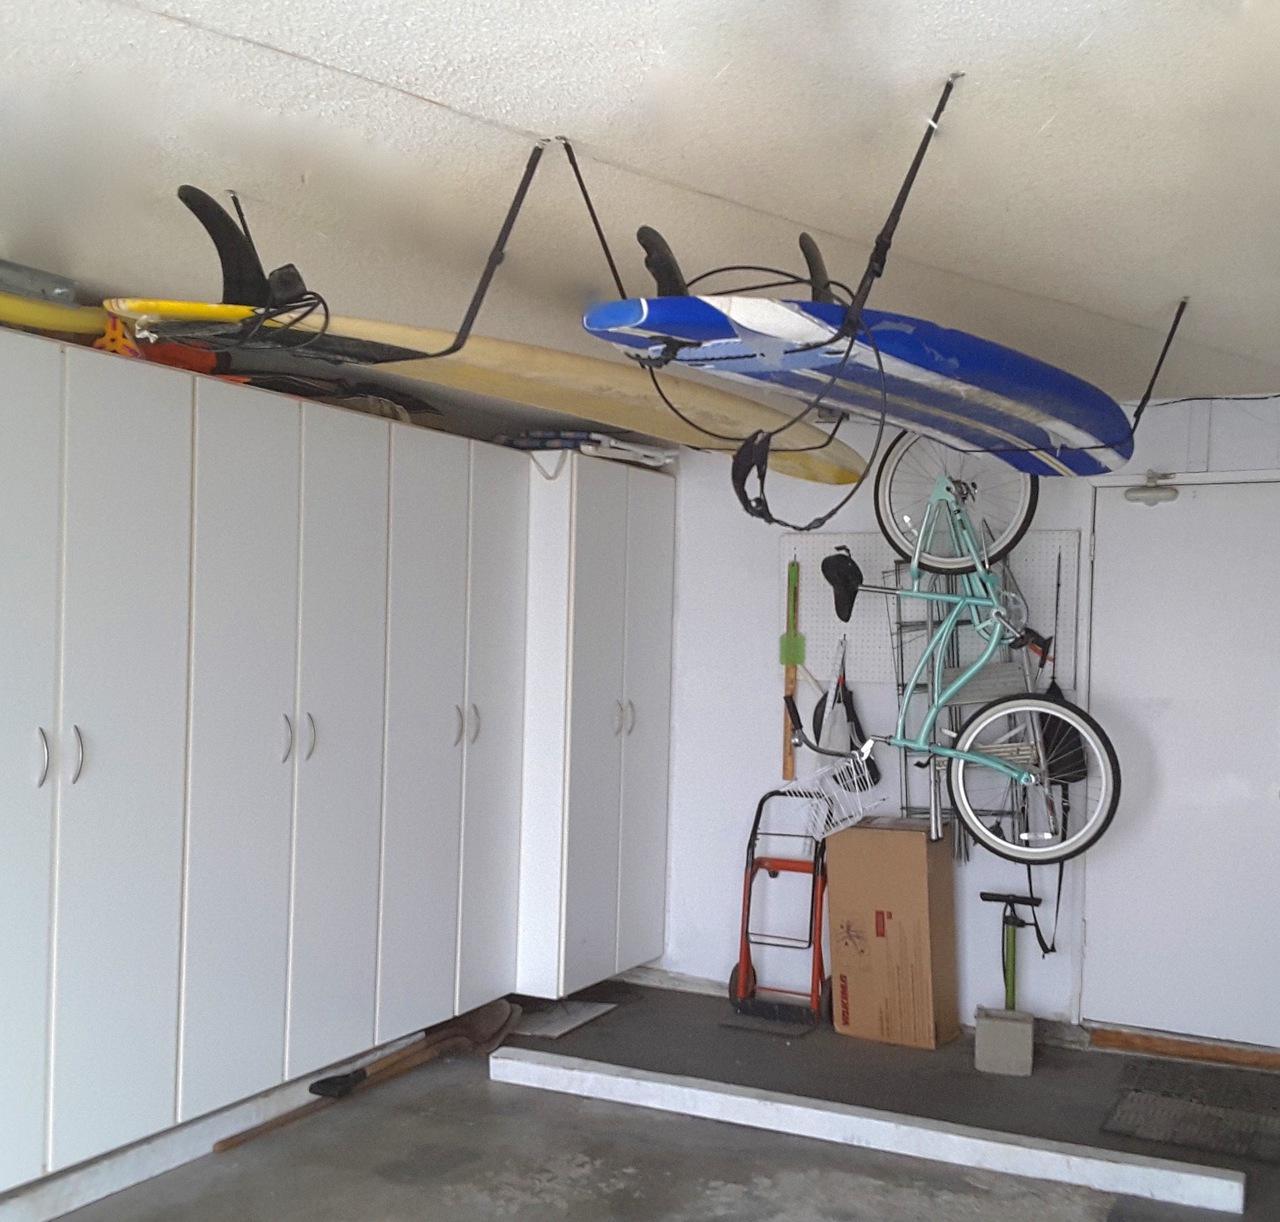 Garage Storage Hang From Ceiling. Kobalt Bluehawk Overhead Garage ...